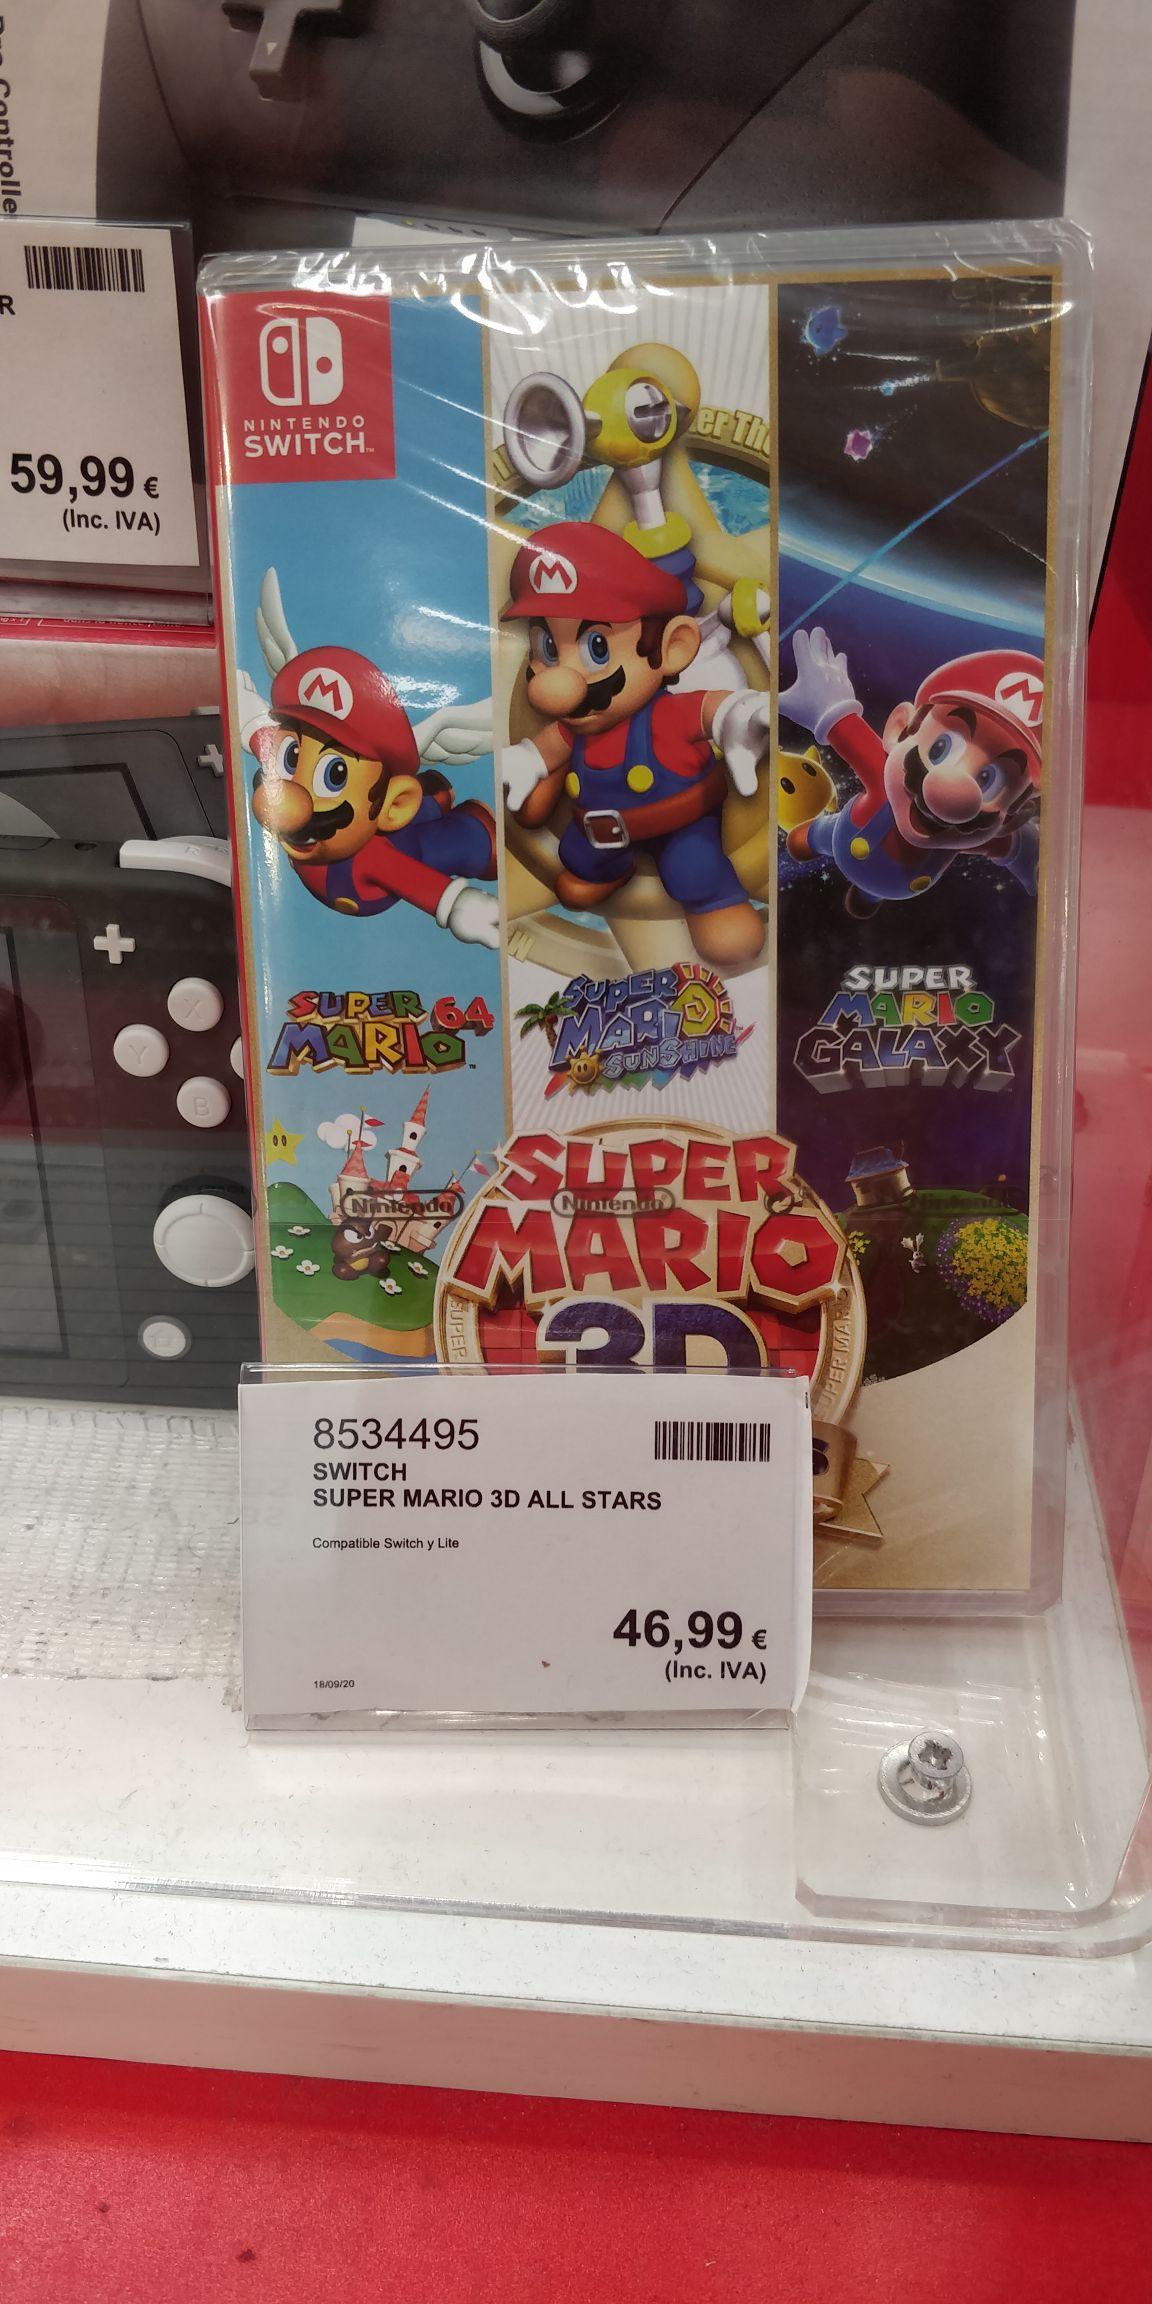 *Costco Getafe* Super Mario 3D All Stars (Nintendo Switch)